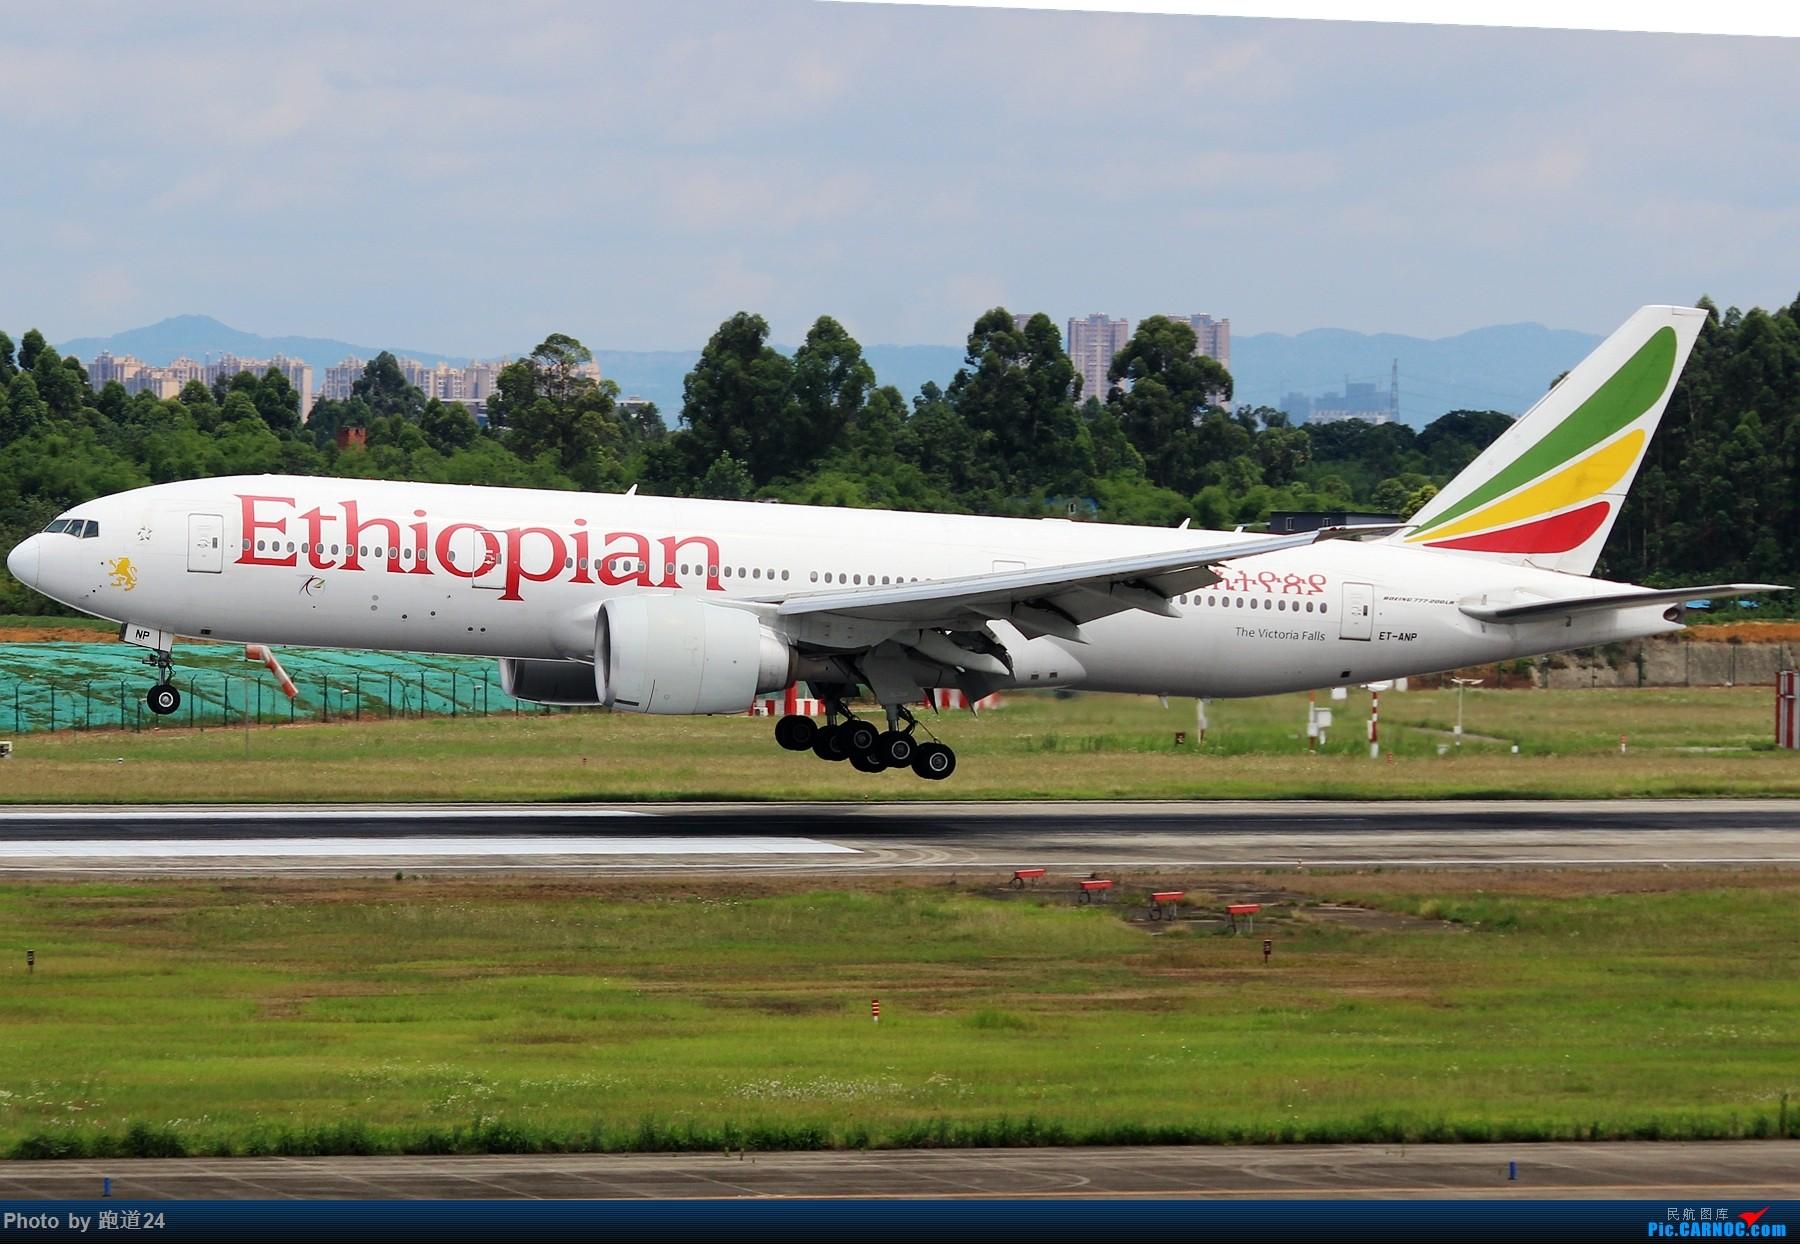 Re:[原创]【多图党】6月18日成都拍机【埃塞俄比亚航空B777-200LR】 BOEING 777-200LR ET-ANP 中国成都双流国际机场